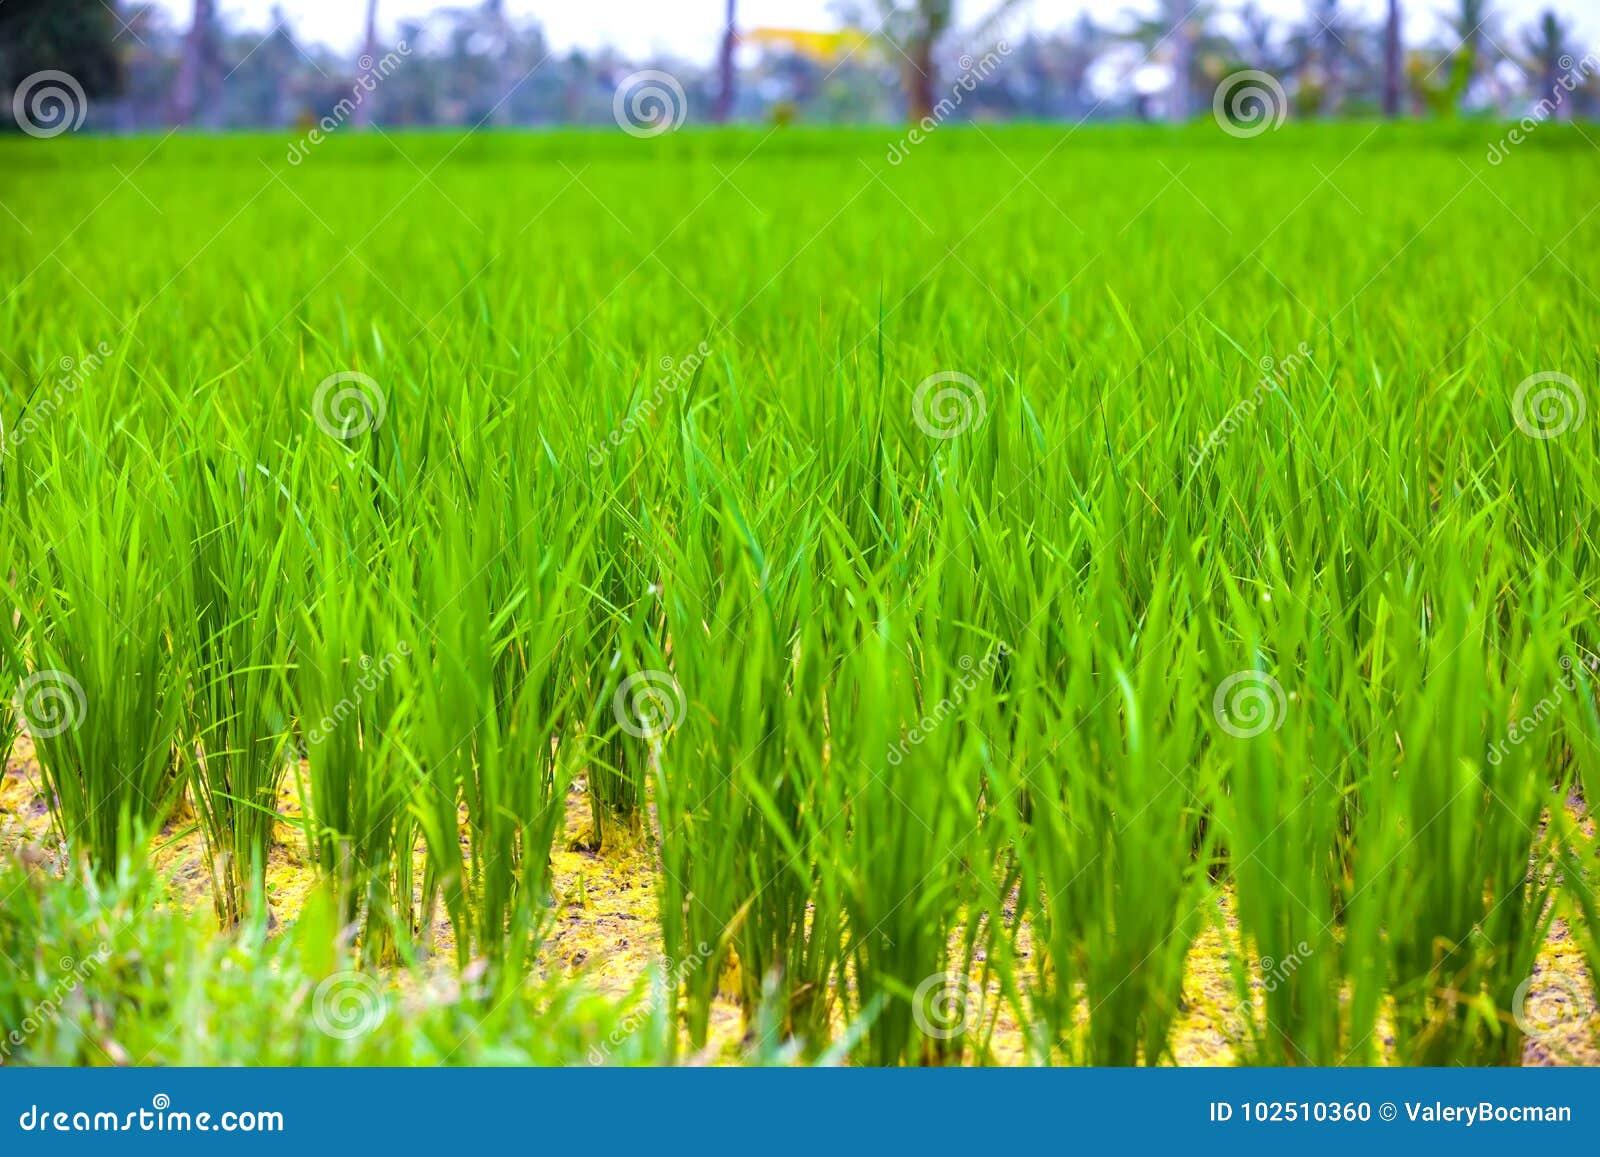 Rice fields in Bali island, Ubud, Indonesia.